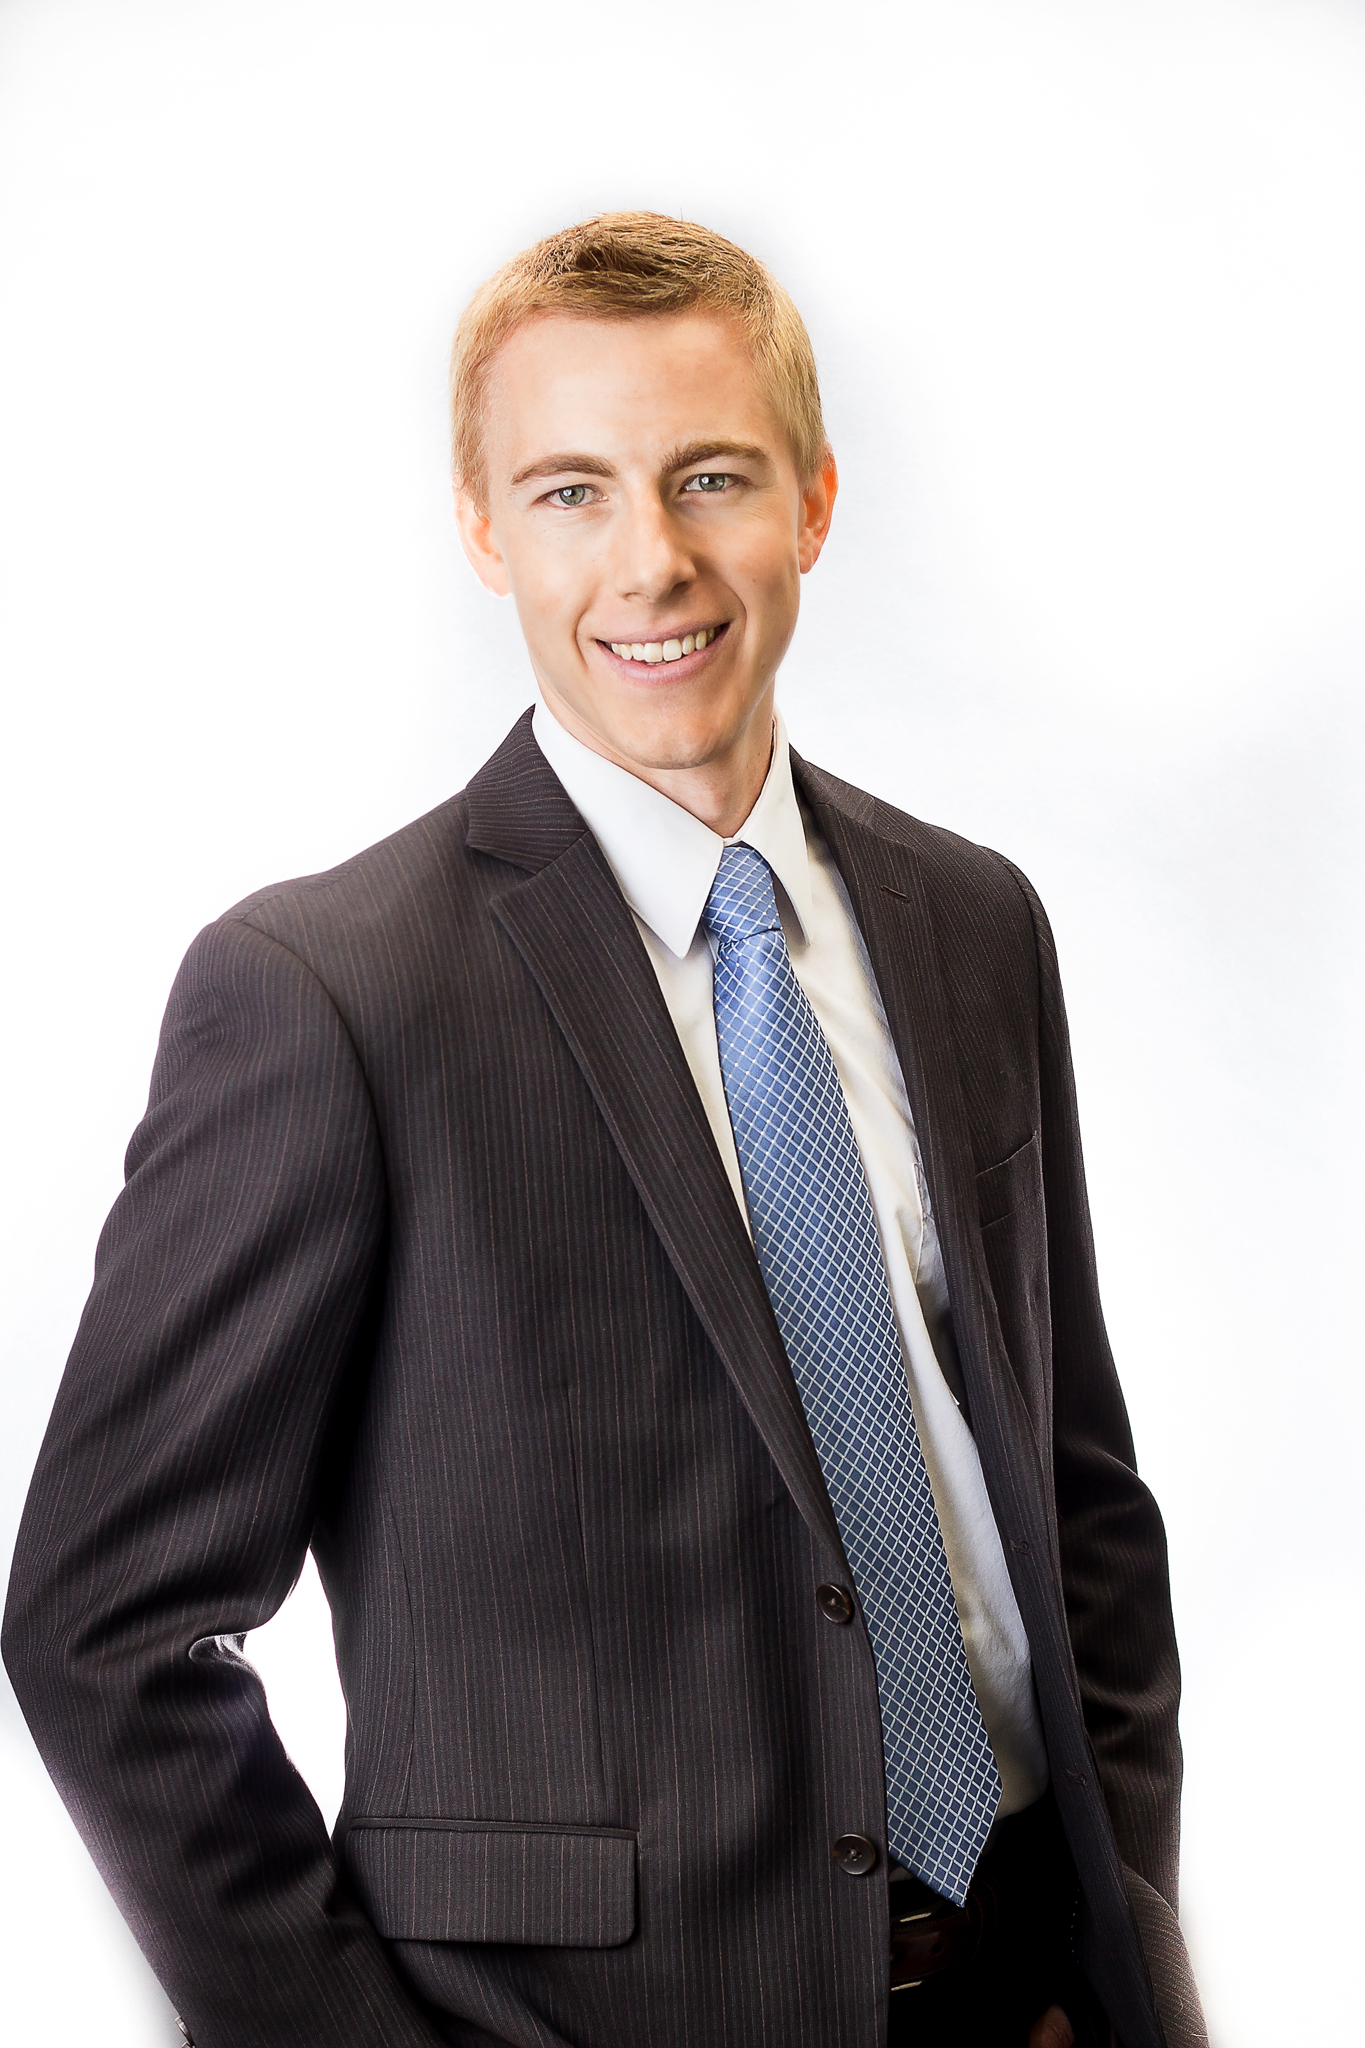 Skylar Bennet - Professional Headshot | Tempe, AZ